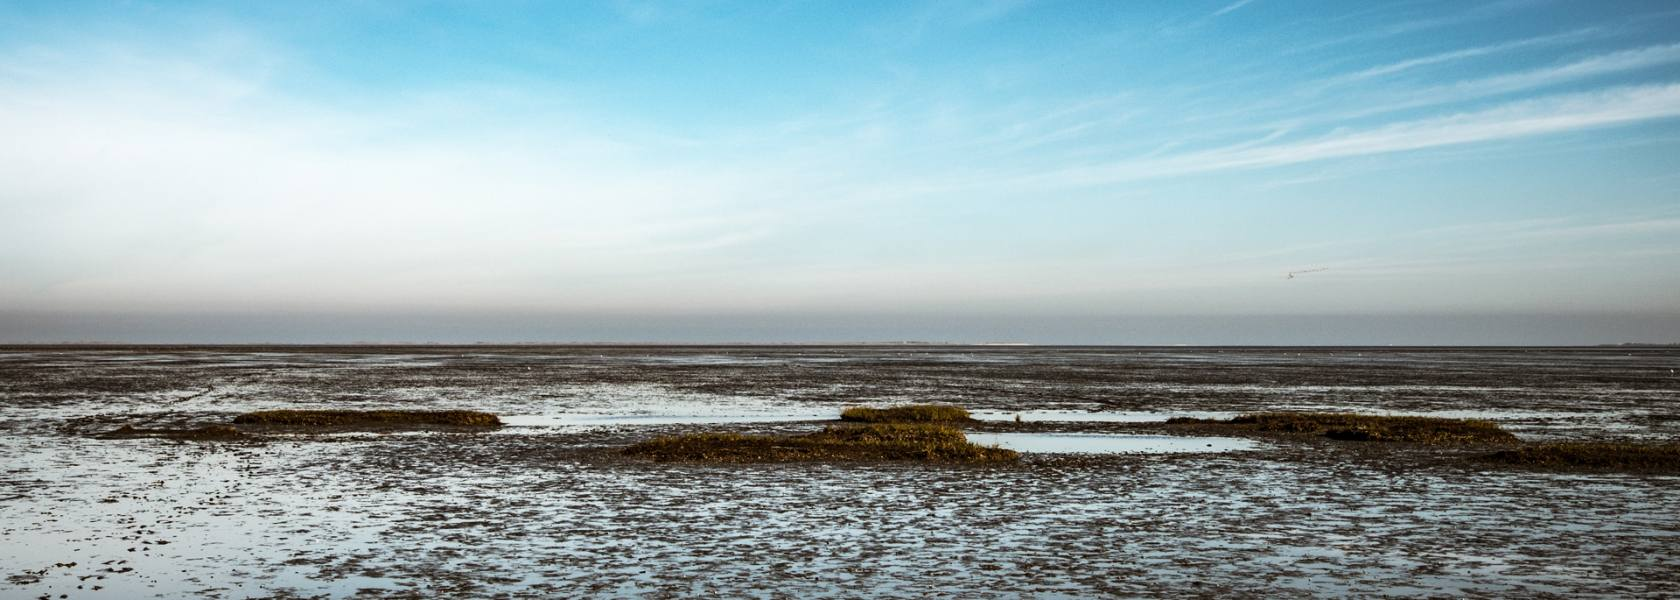 Wattenmeer, © Andrea Ullius, ullala.ch